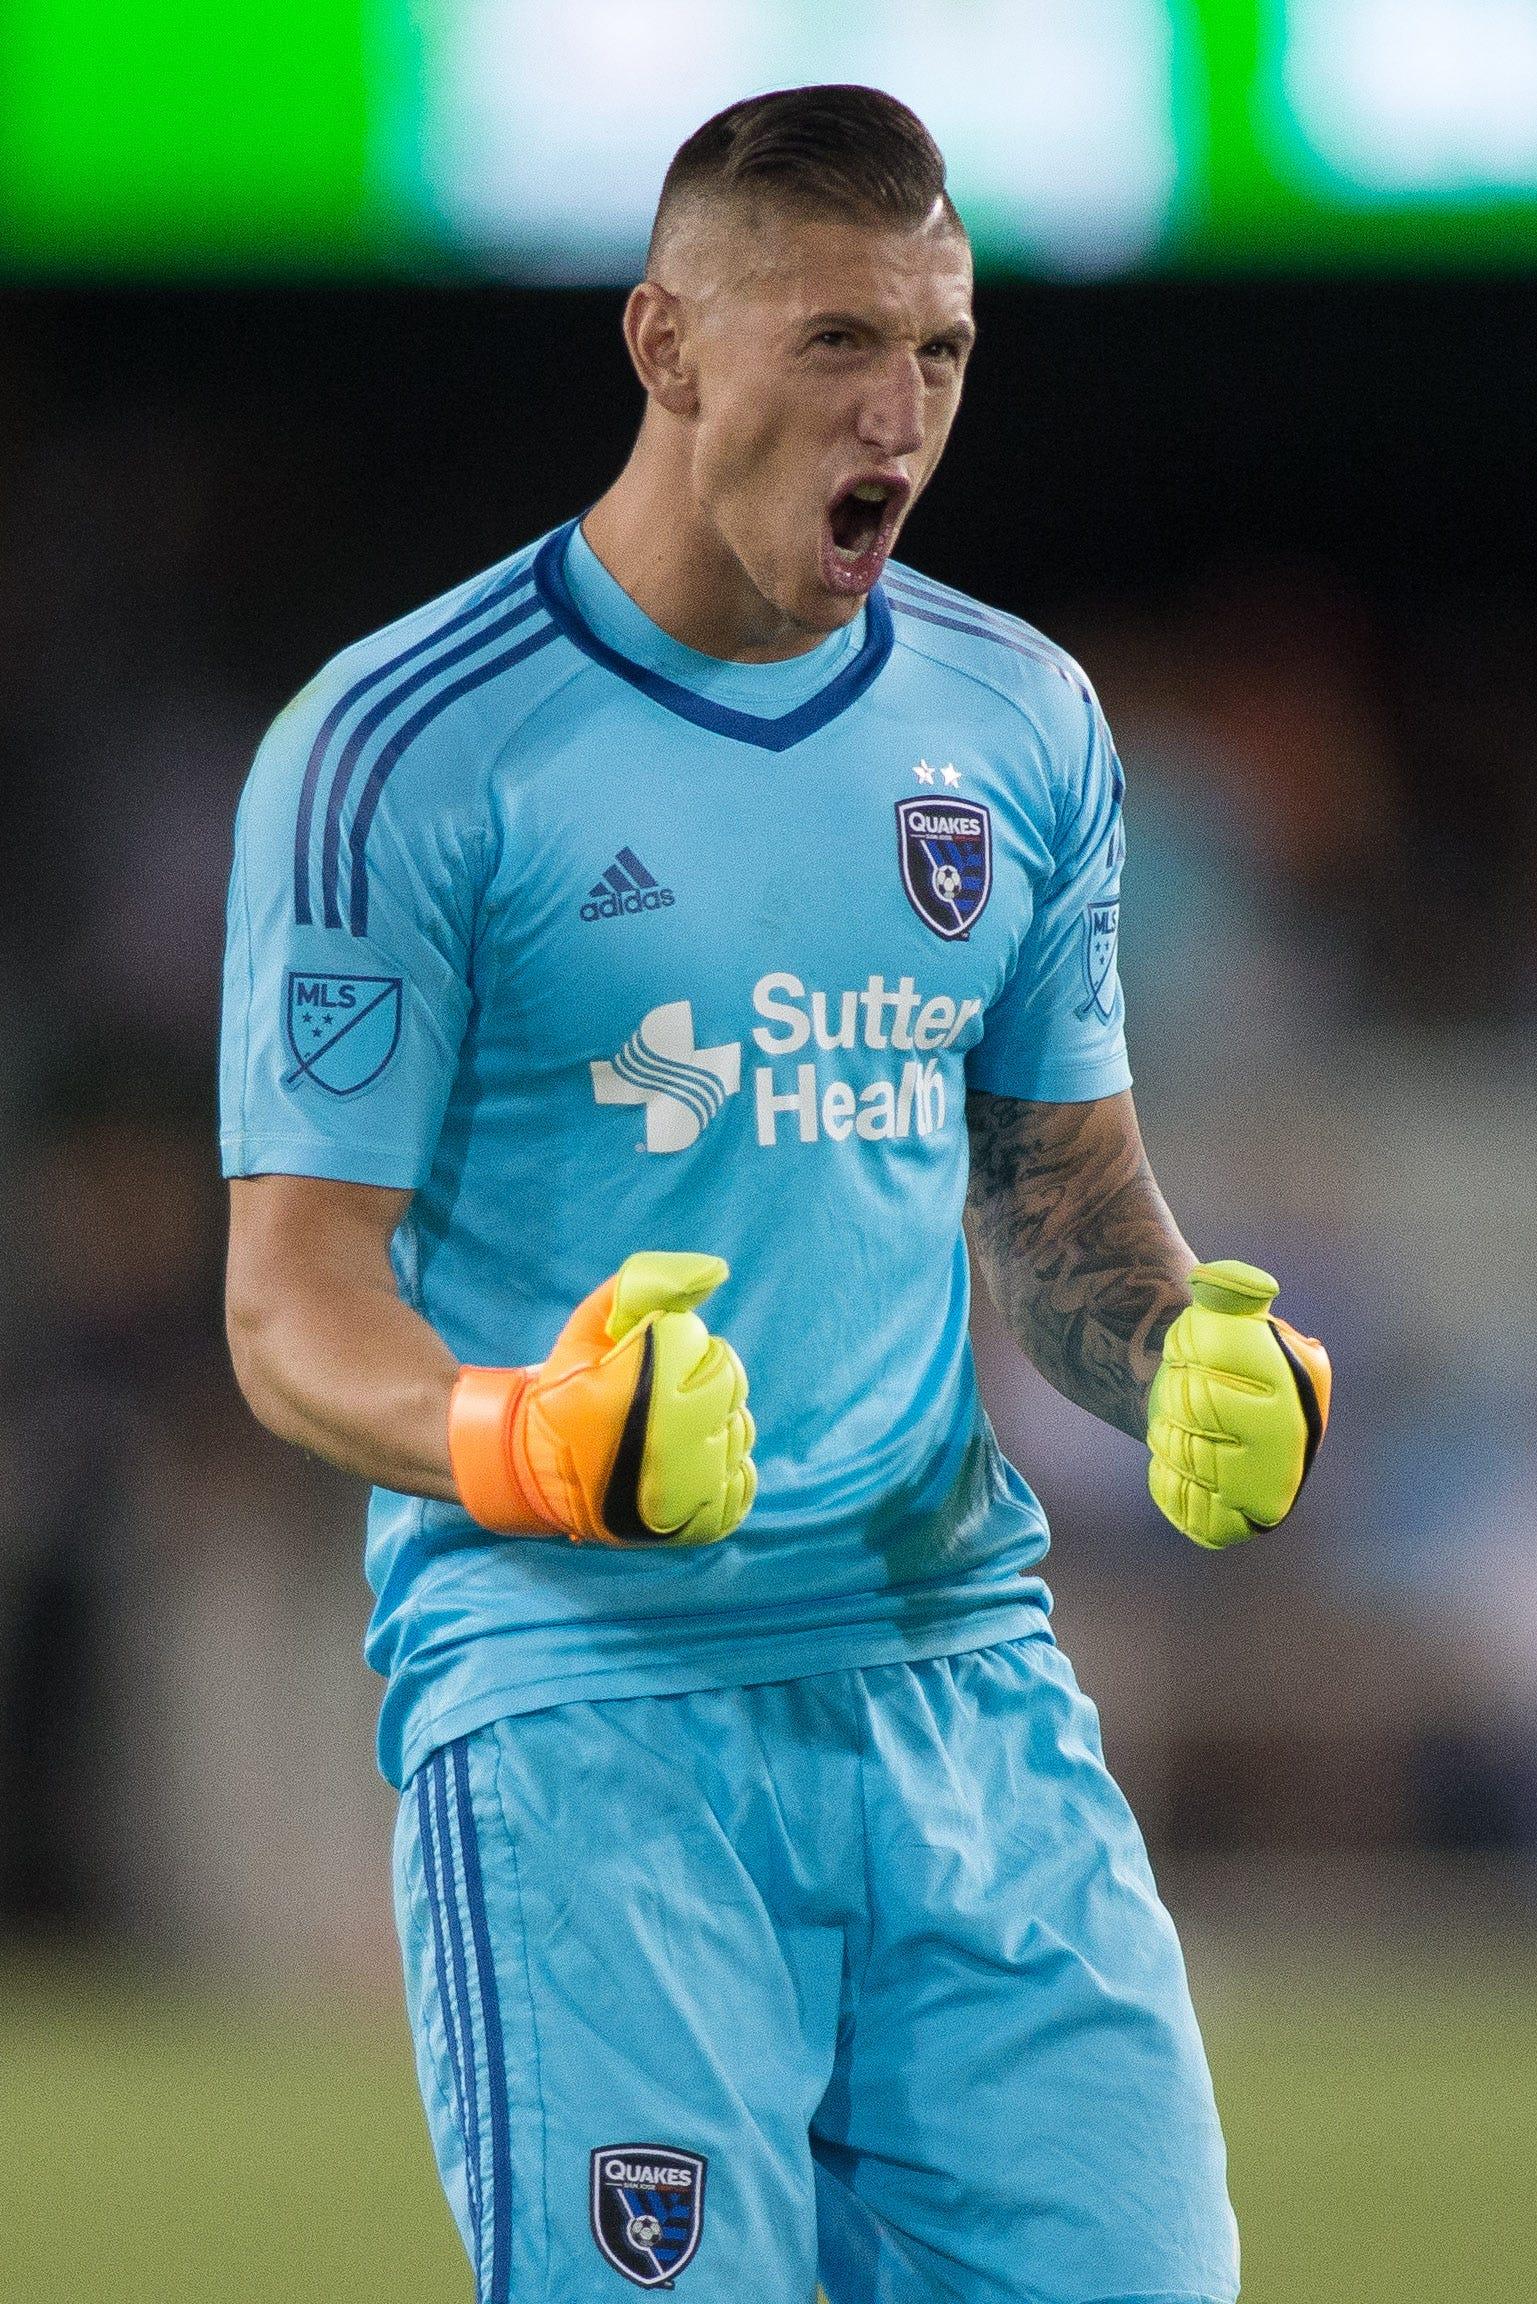 Los Angeles Galaxy sign goalkeeper David Bingham